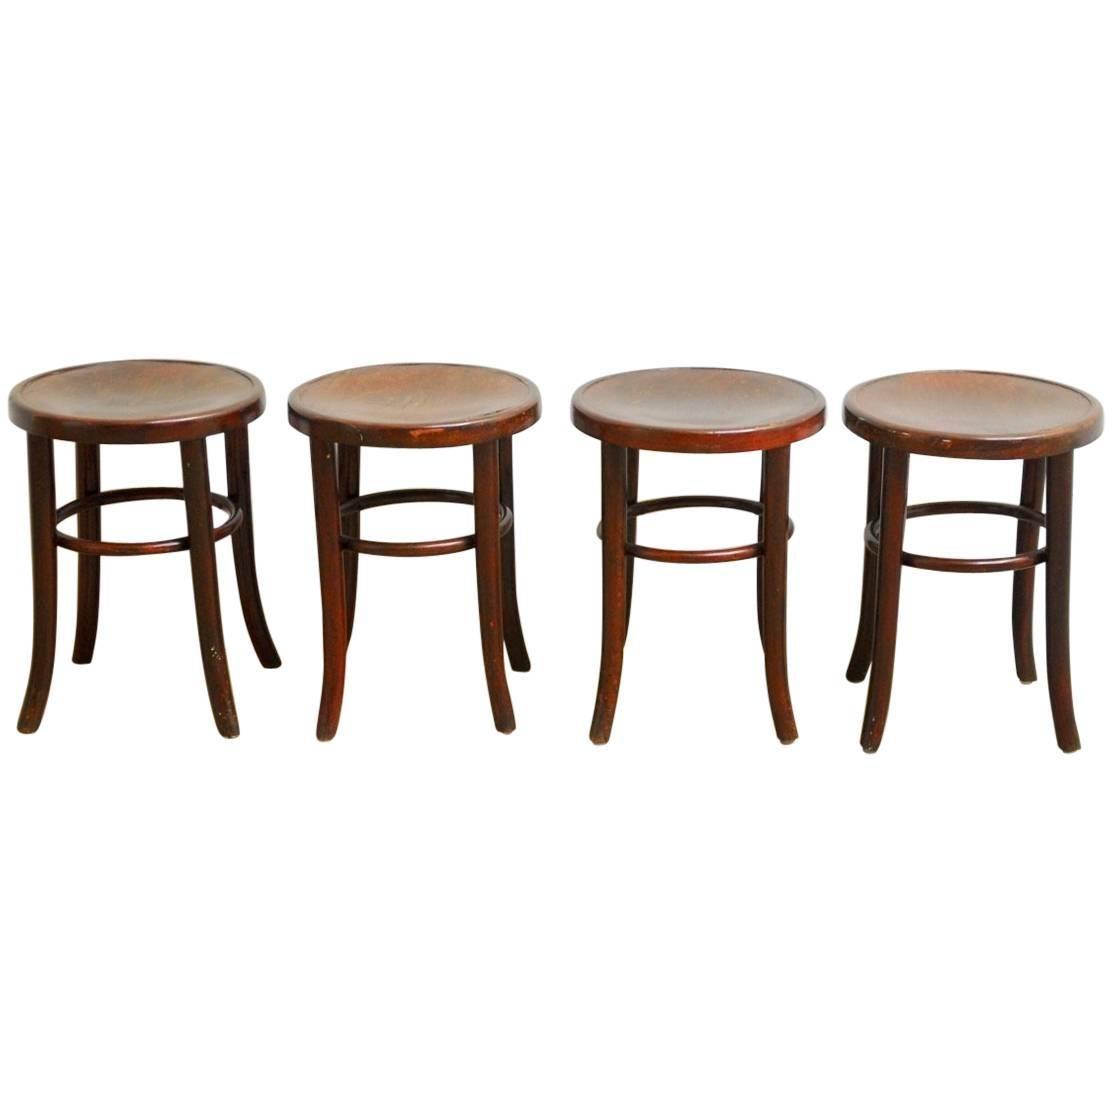 Set Of Four Gebruder Thonet Bentwood Bistro Stools Thonet Bar Stool57